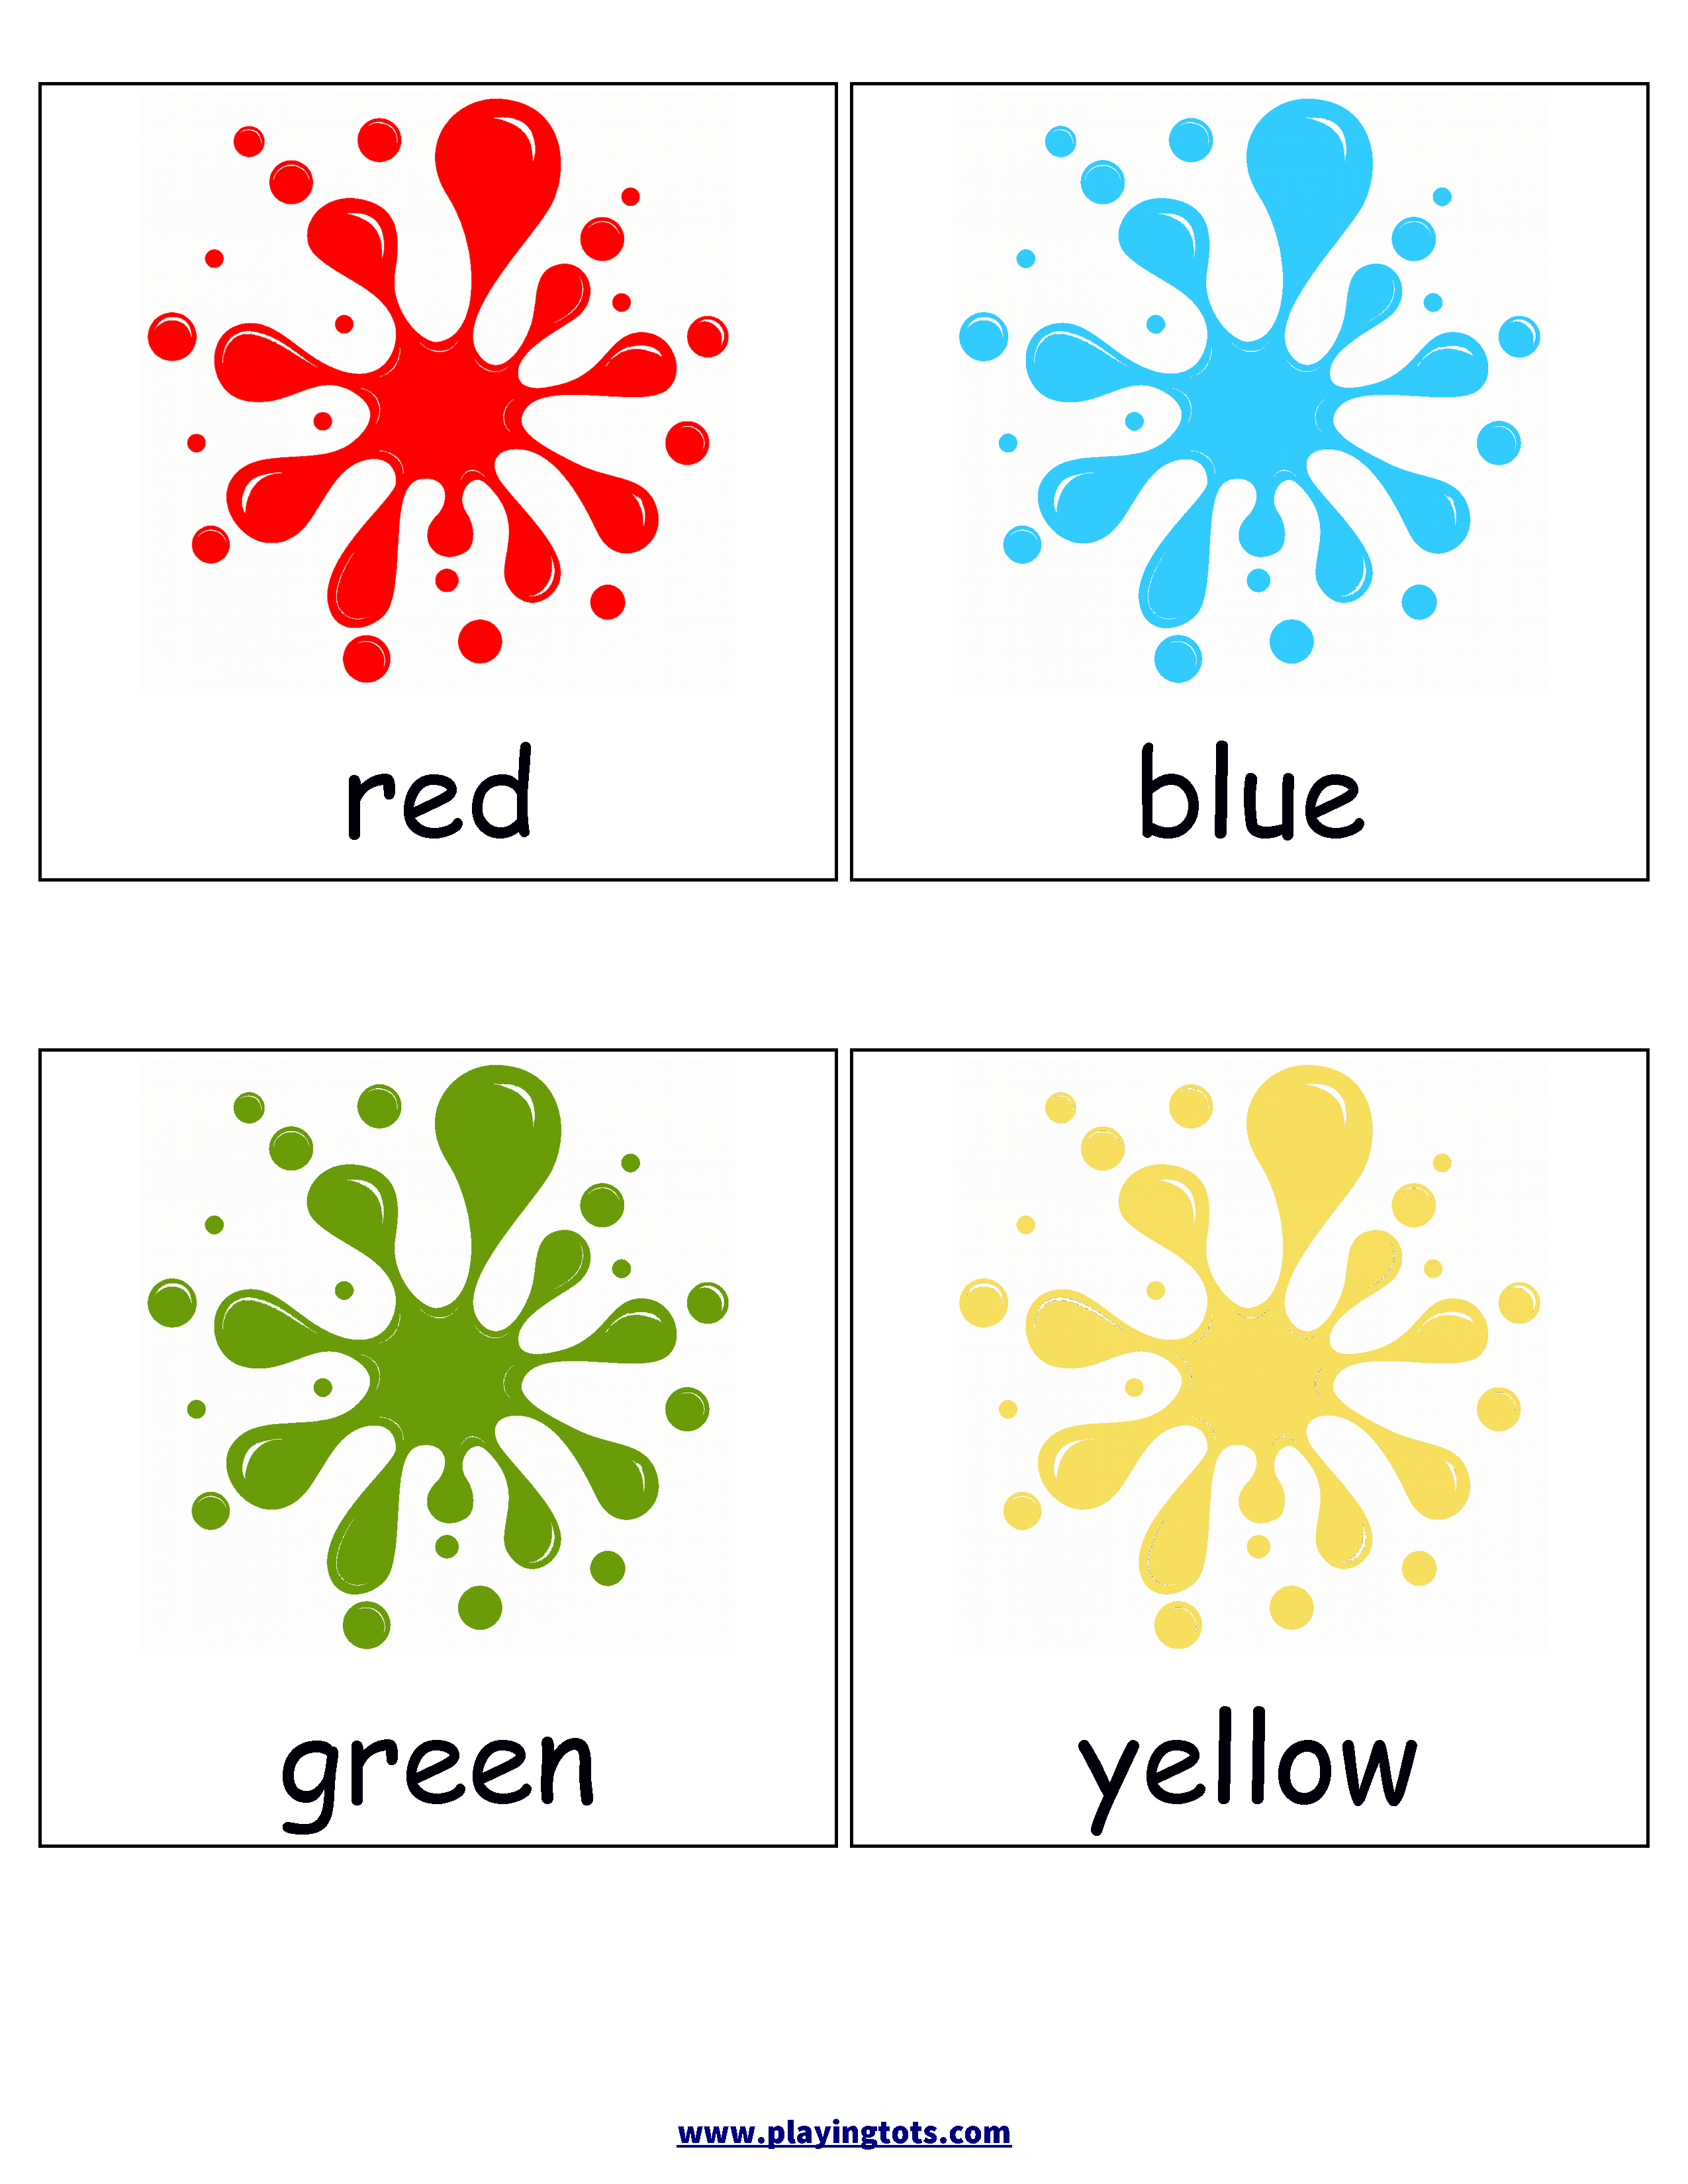 Free Printable Colors Flash Cards   Ell/esl Flashcards, Games, Apps - Free Printable Colour Flashcards